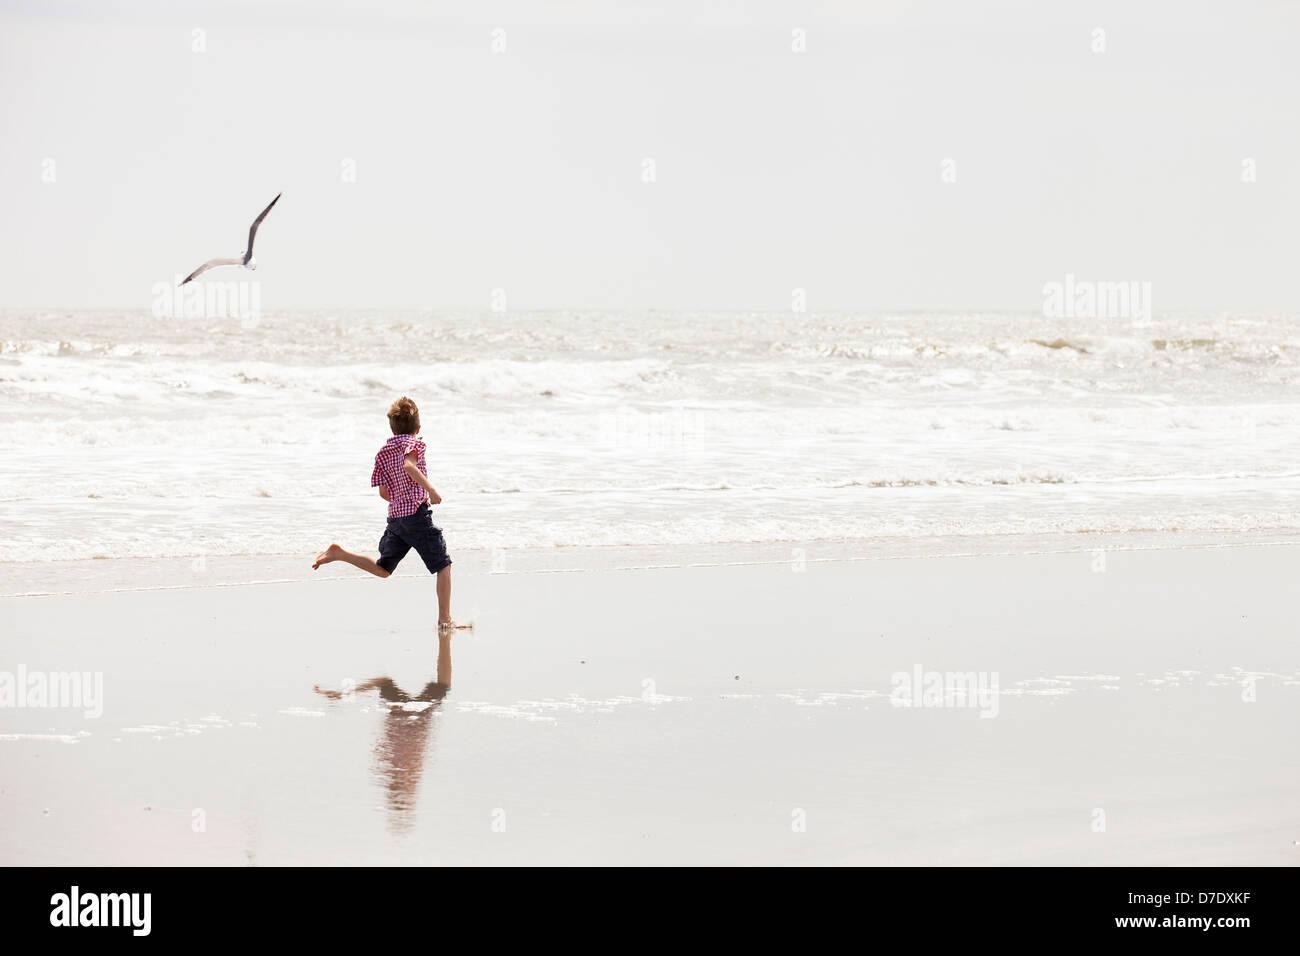 Junge am Strand laufen Stockbild